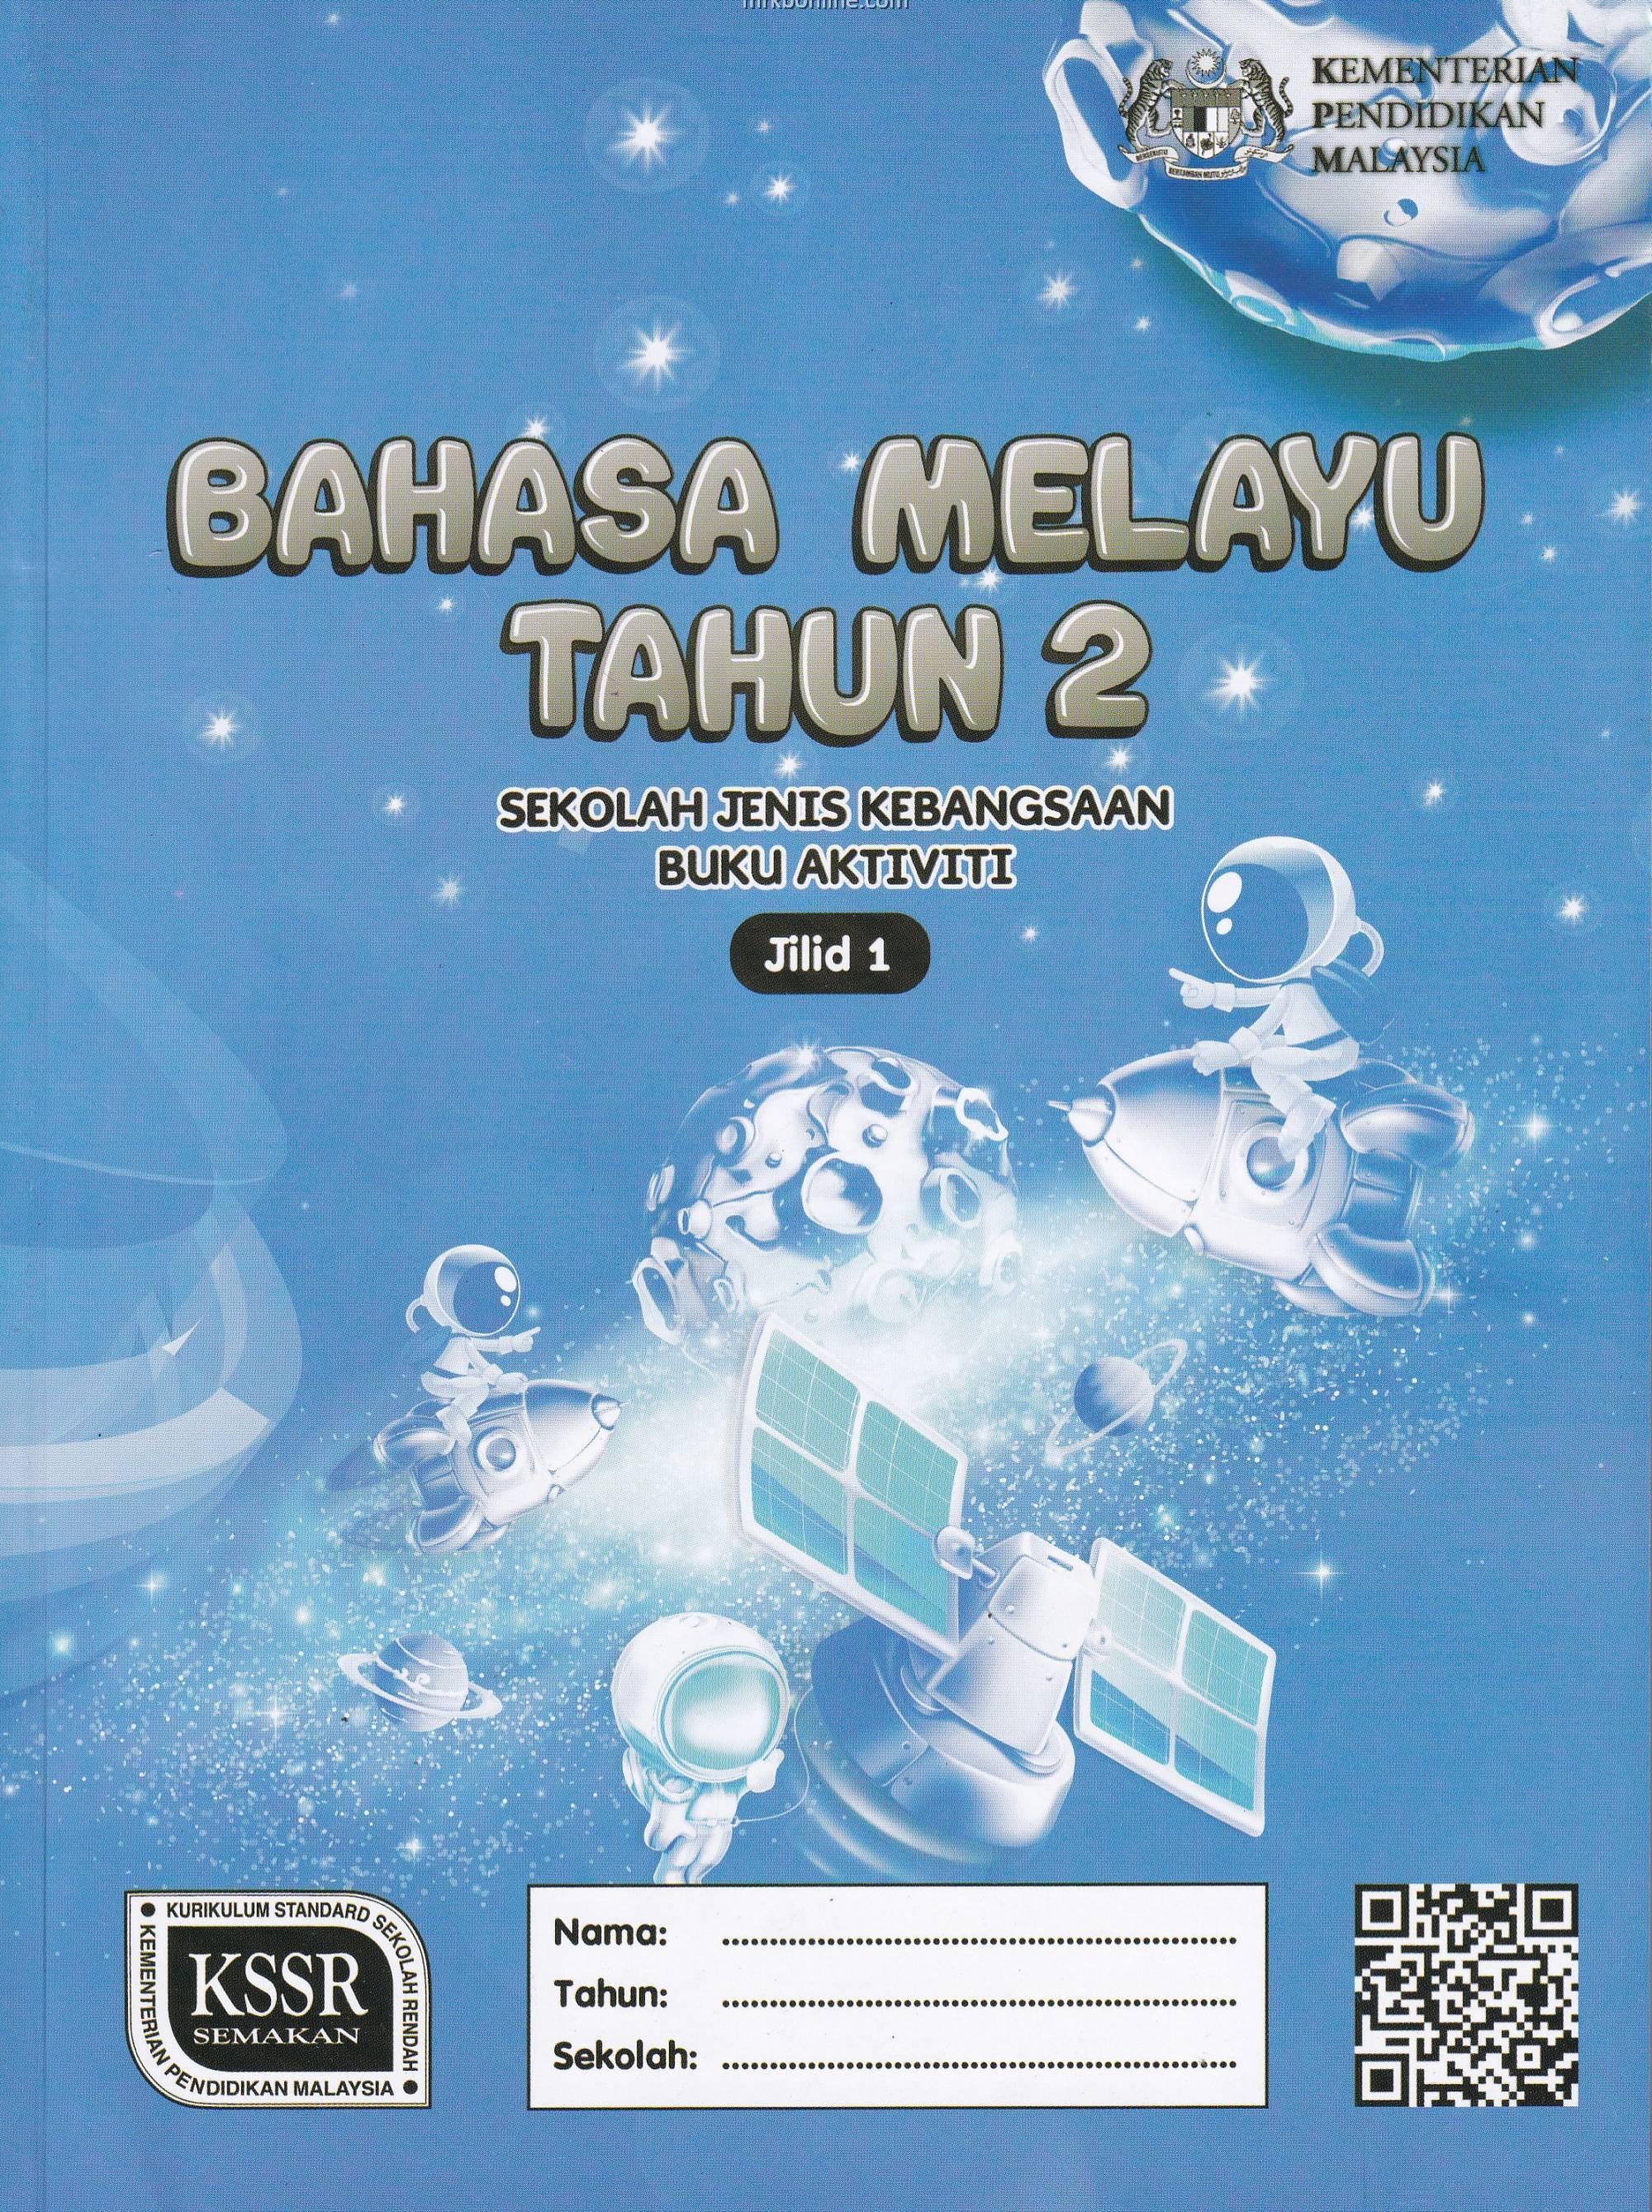 Buku Aktiviti Bahasa Melayu Jilid 1 Sjk Tahun 2